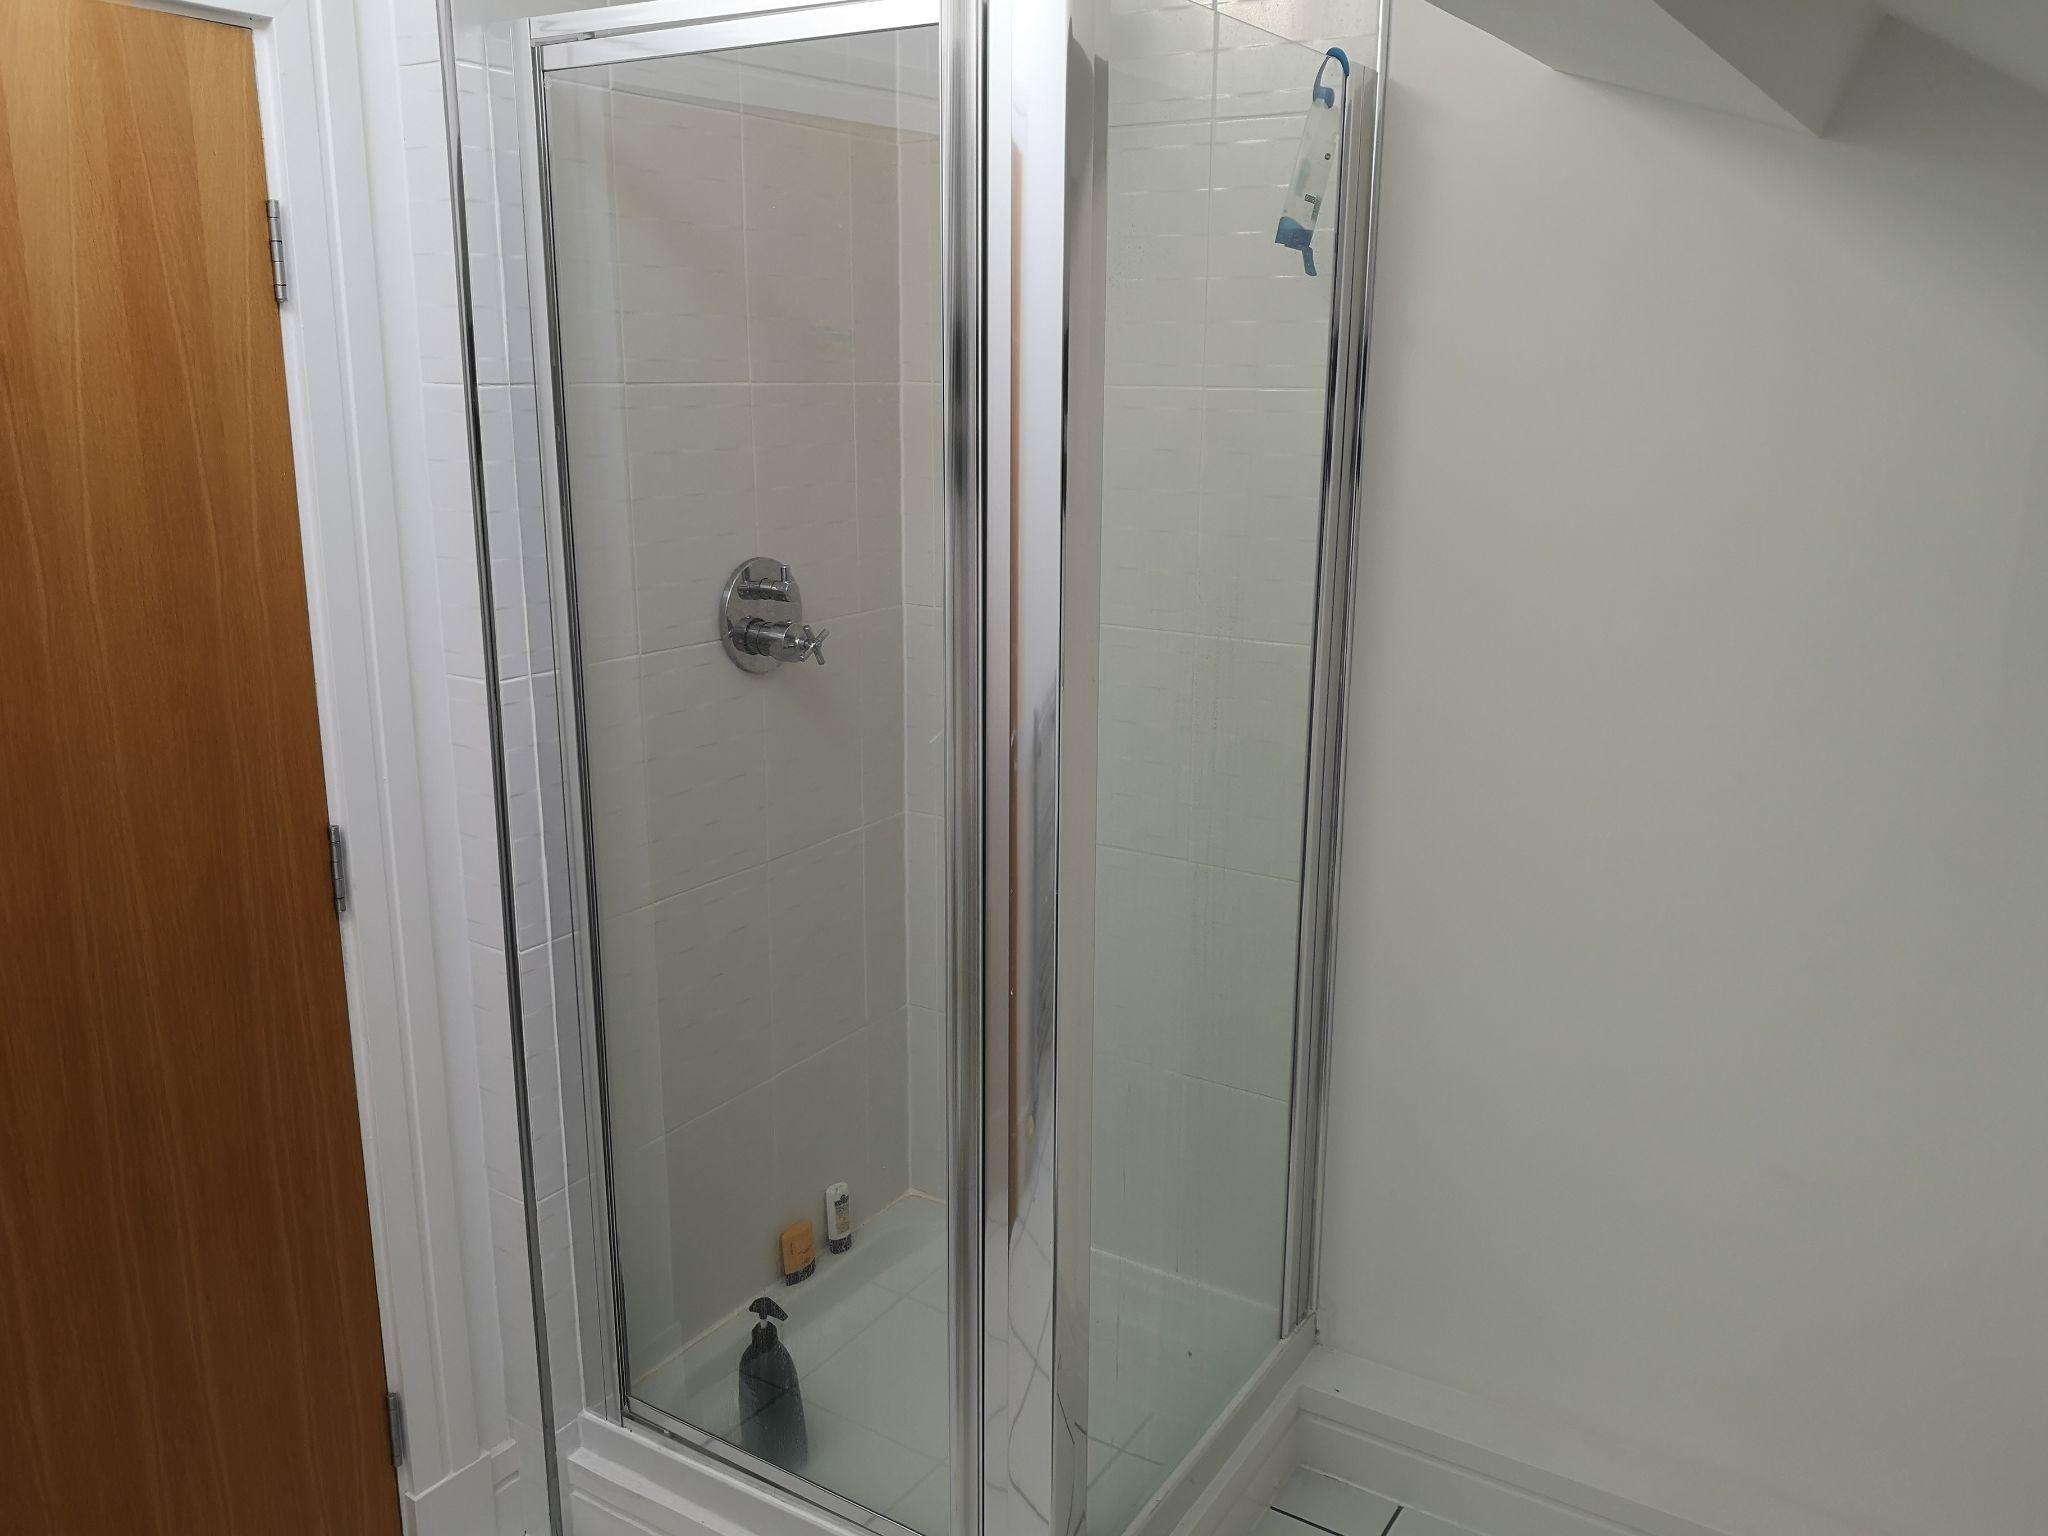 2 bedroom apartment flat/apartment Let in Huddersfield - En-suite